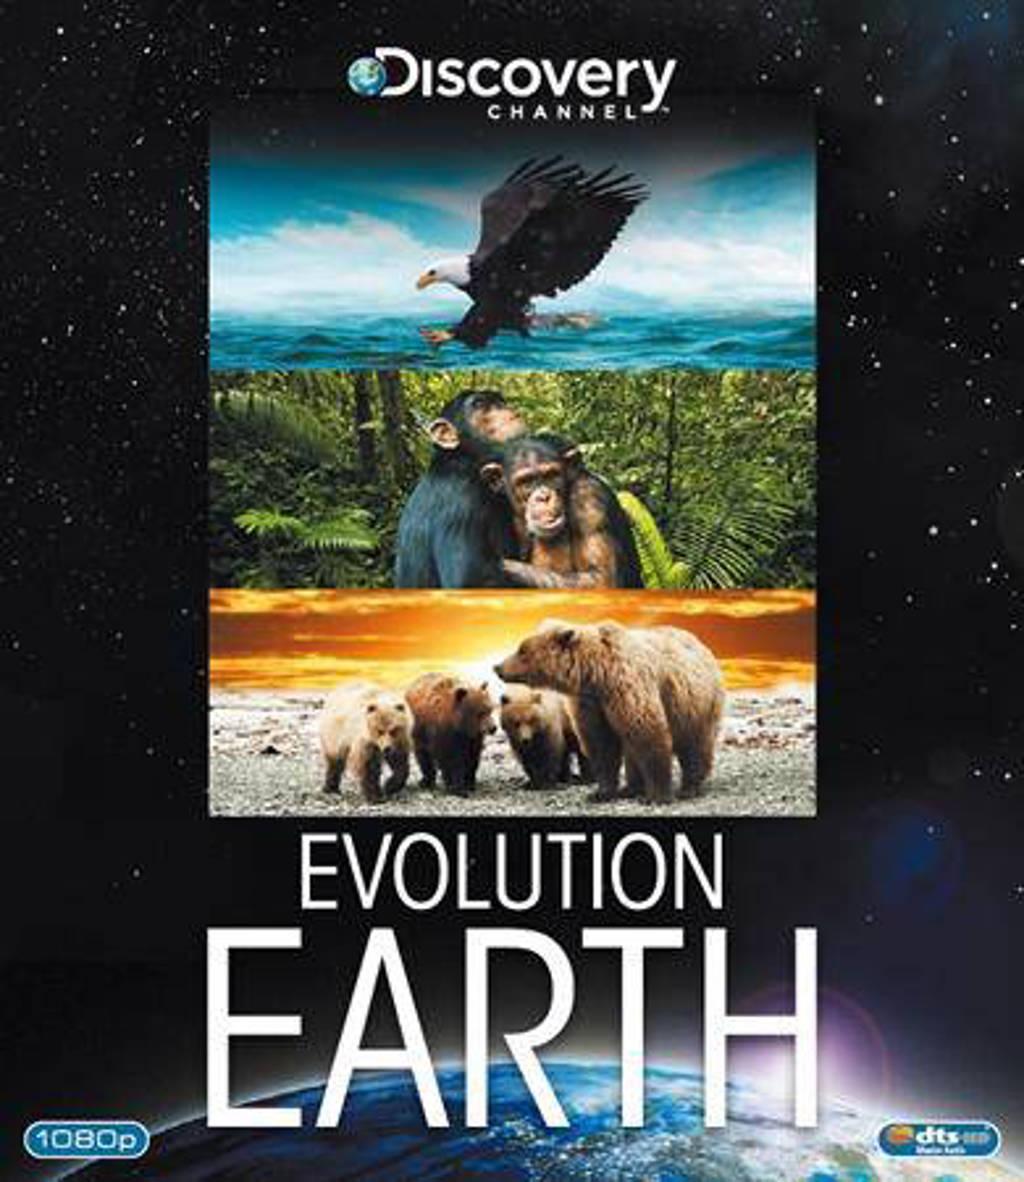 Evolution earth (Blu-ray)